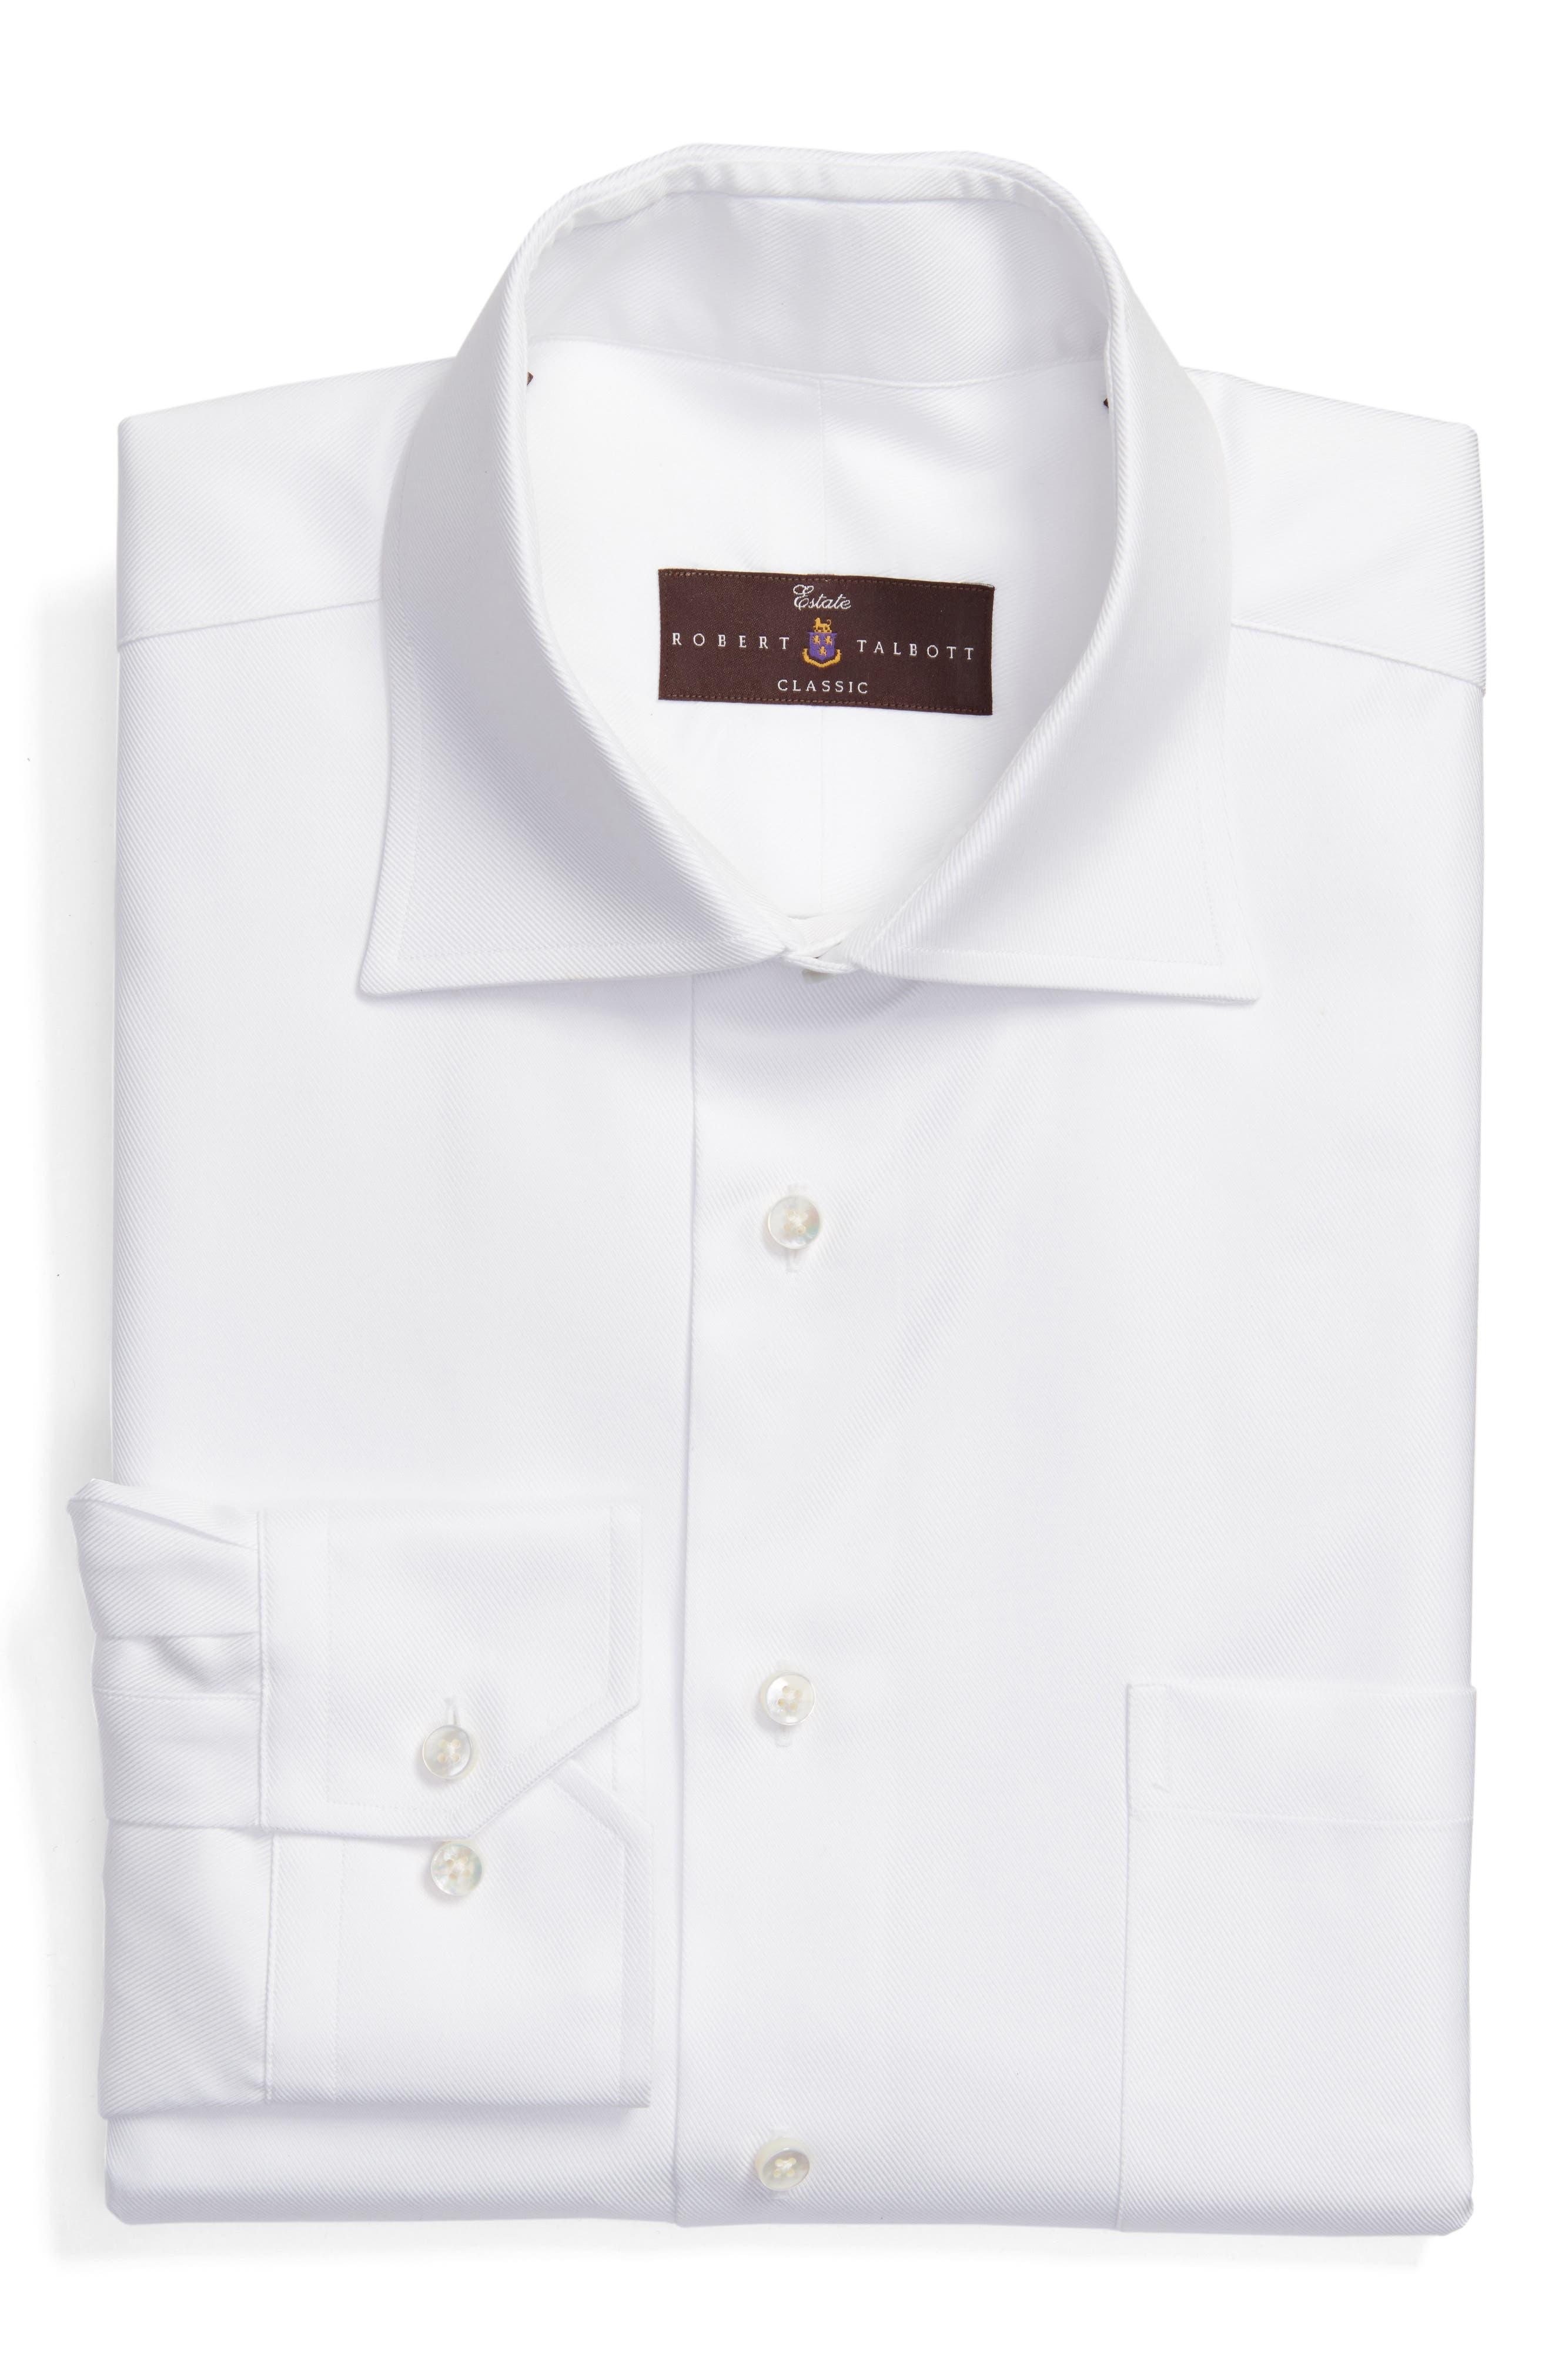 Classic Fit Dress Shirt,                         Main,                         color, White